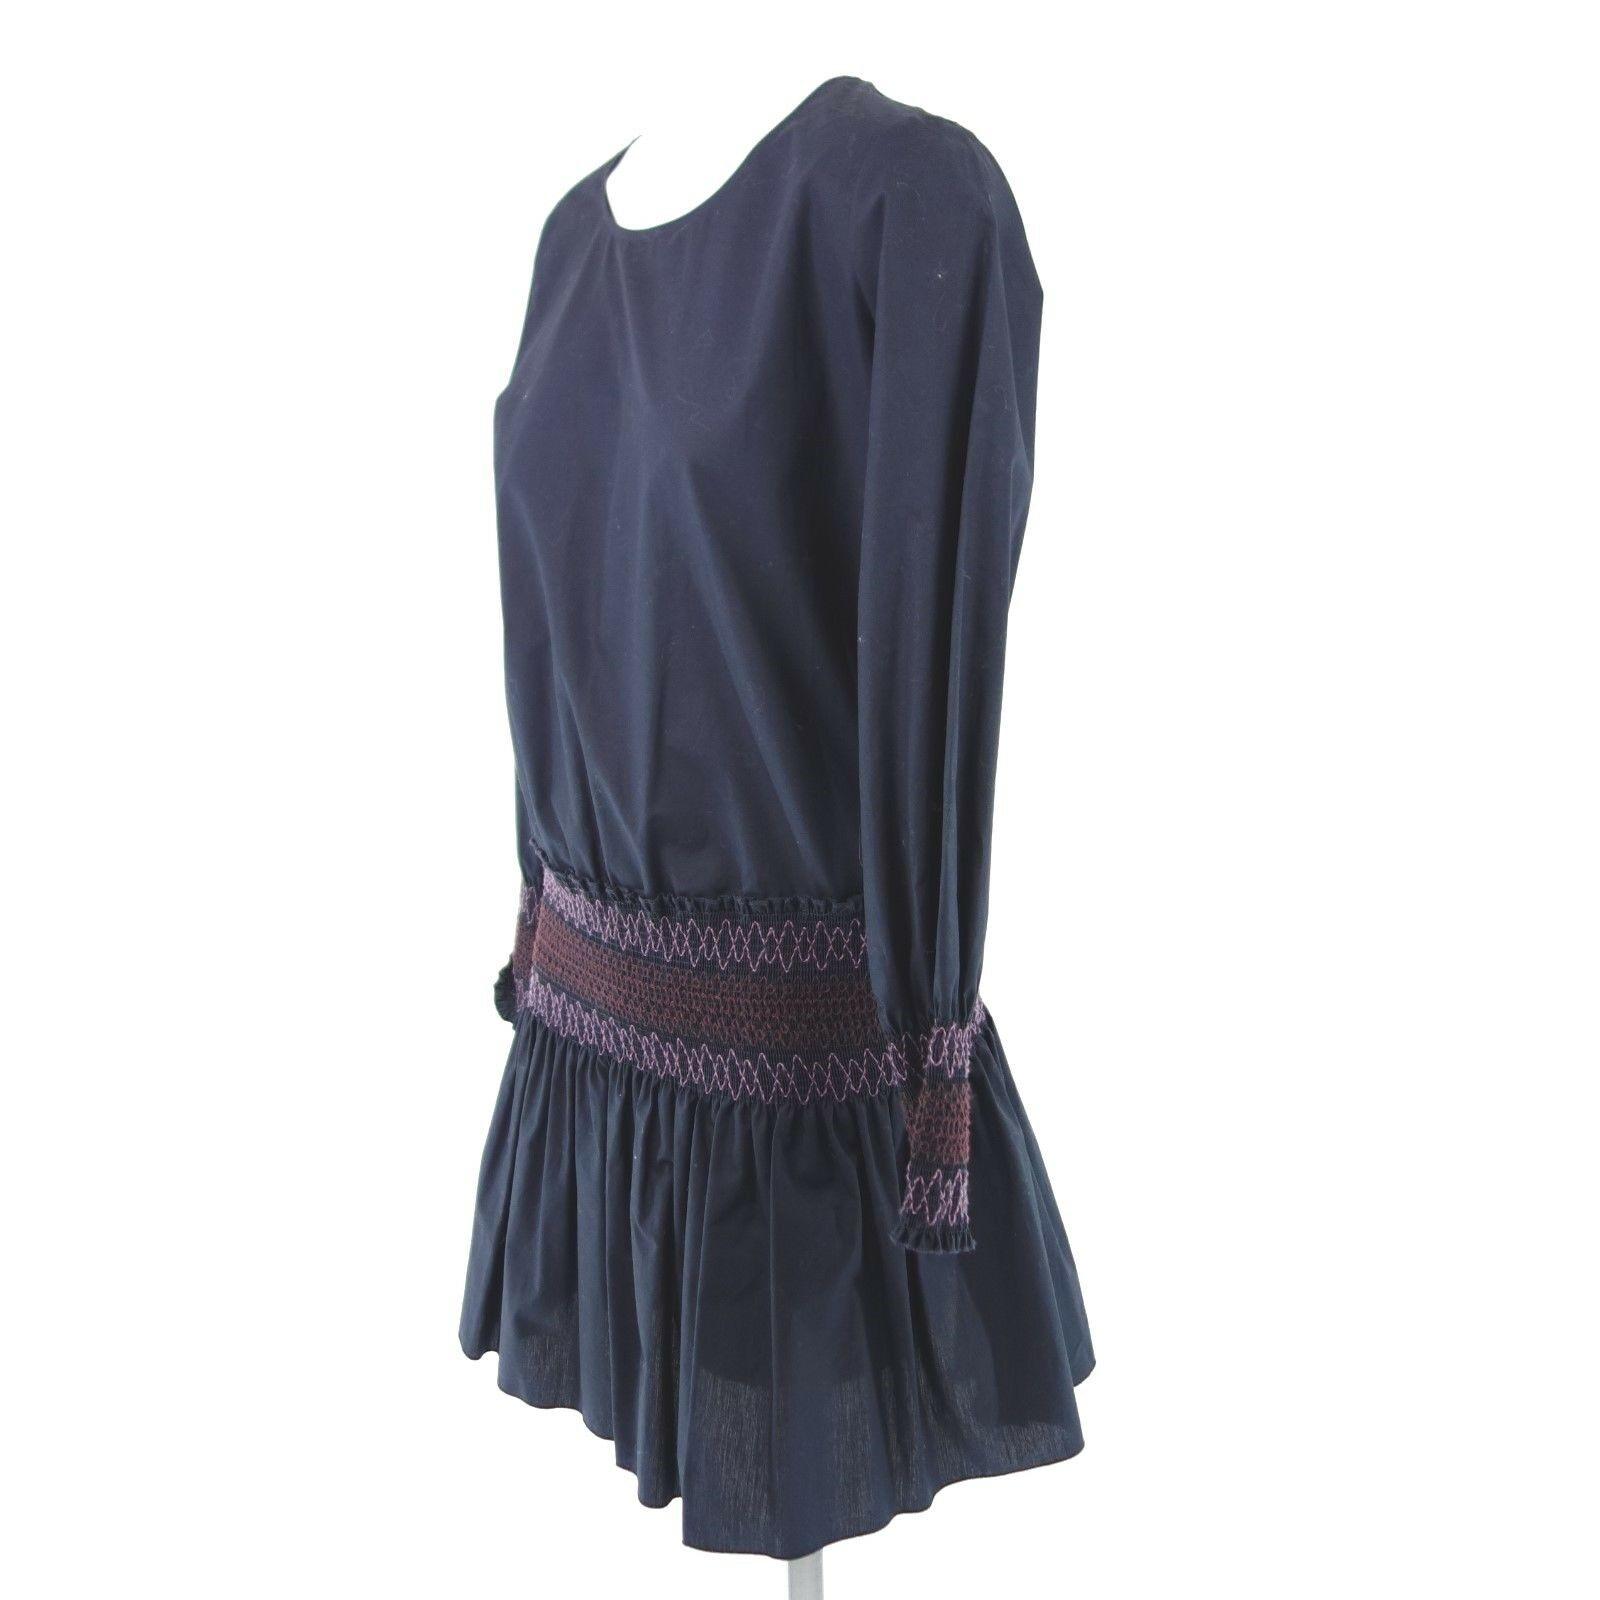 Chloe Seechloé Damen Tunika Kleid S6Aro11S6A006 38